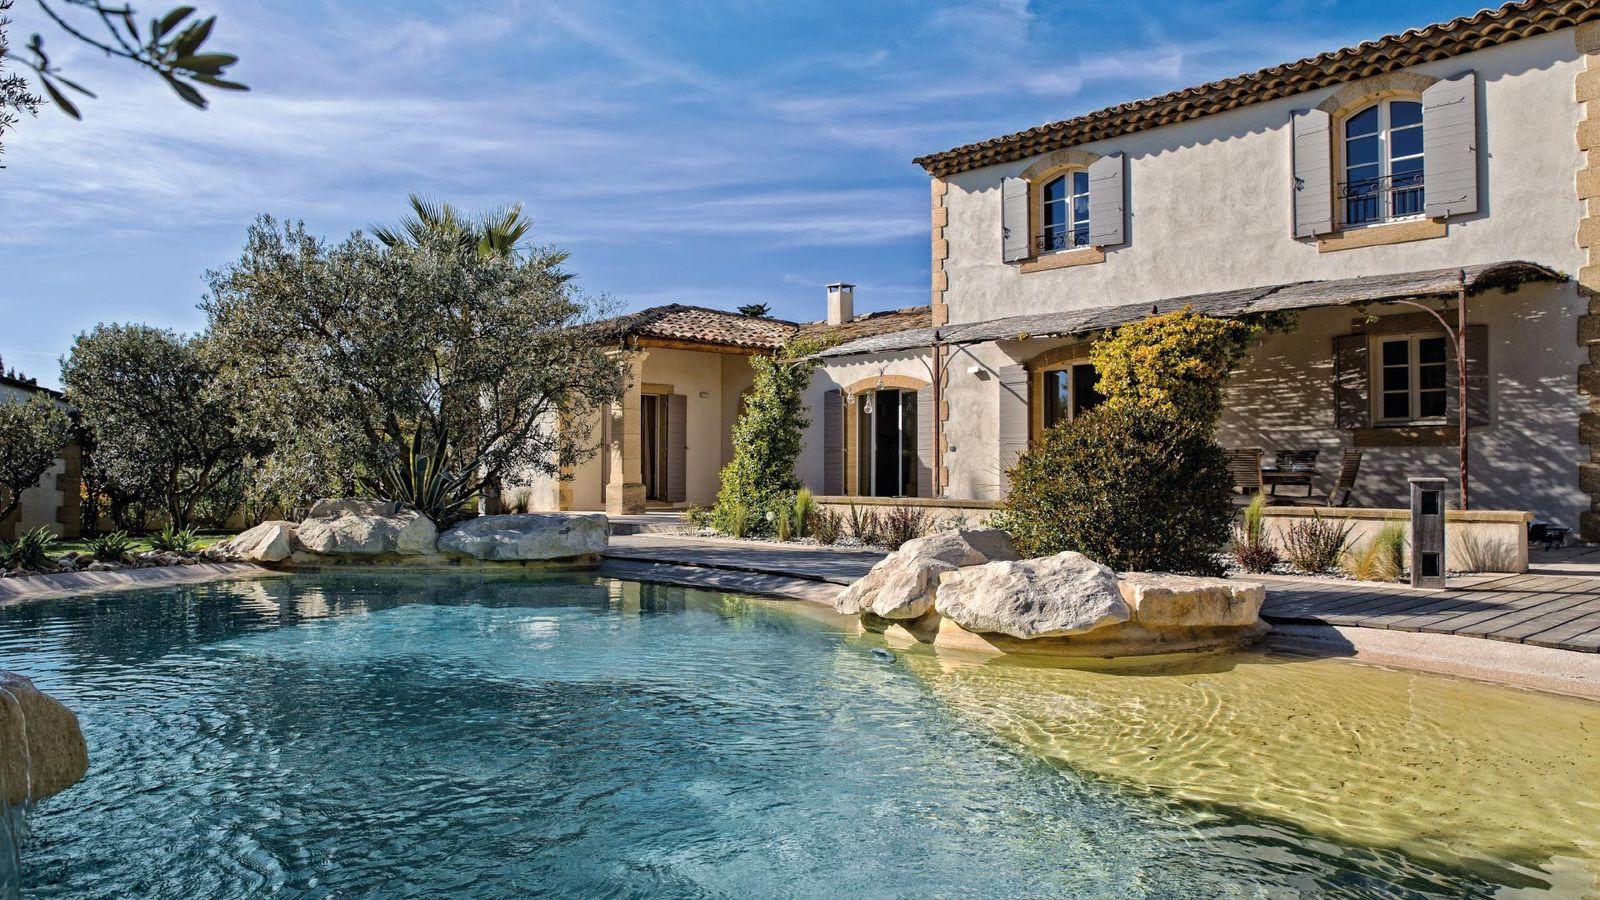 Outstanding villa Rental in Saint Remy de Provence 7